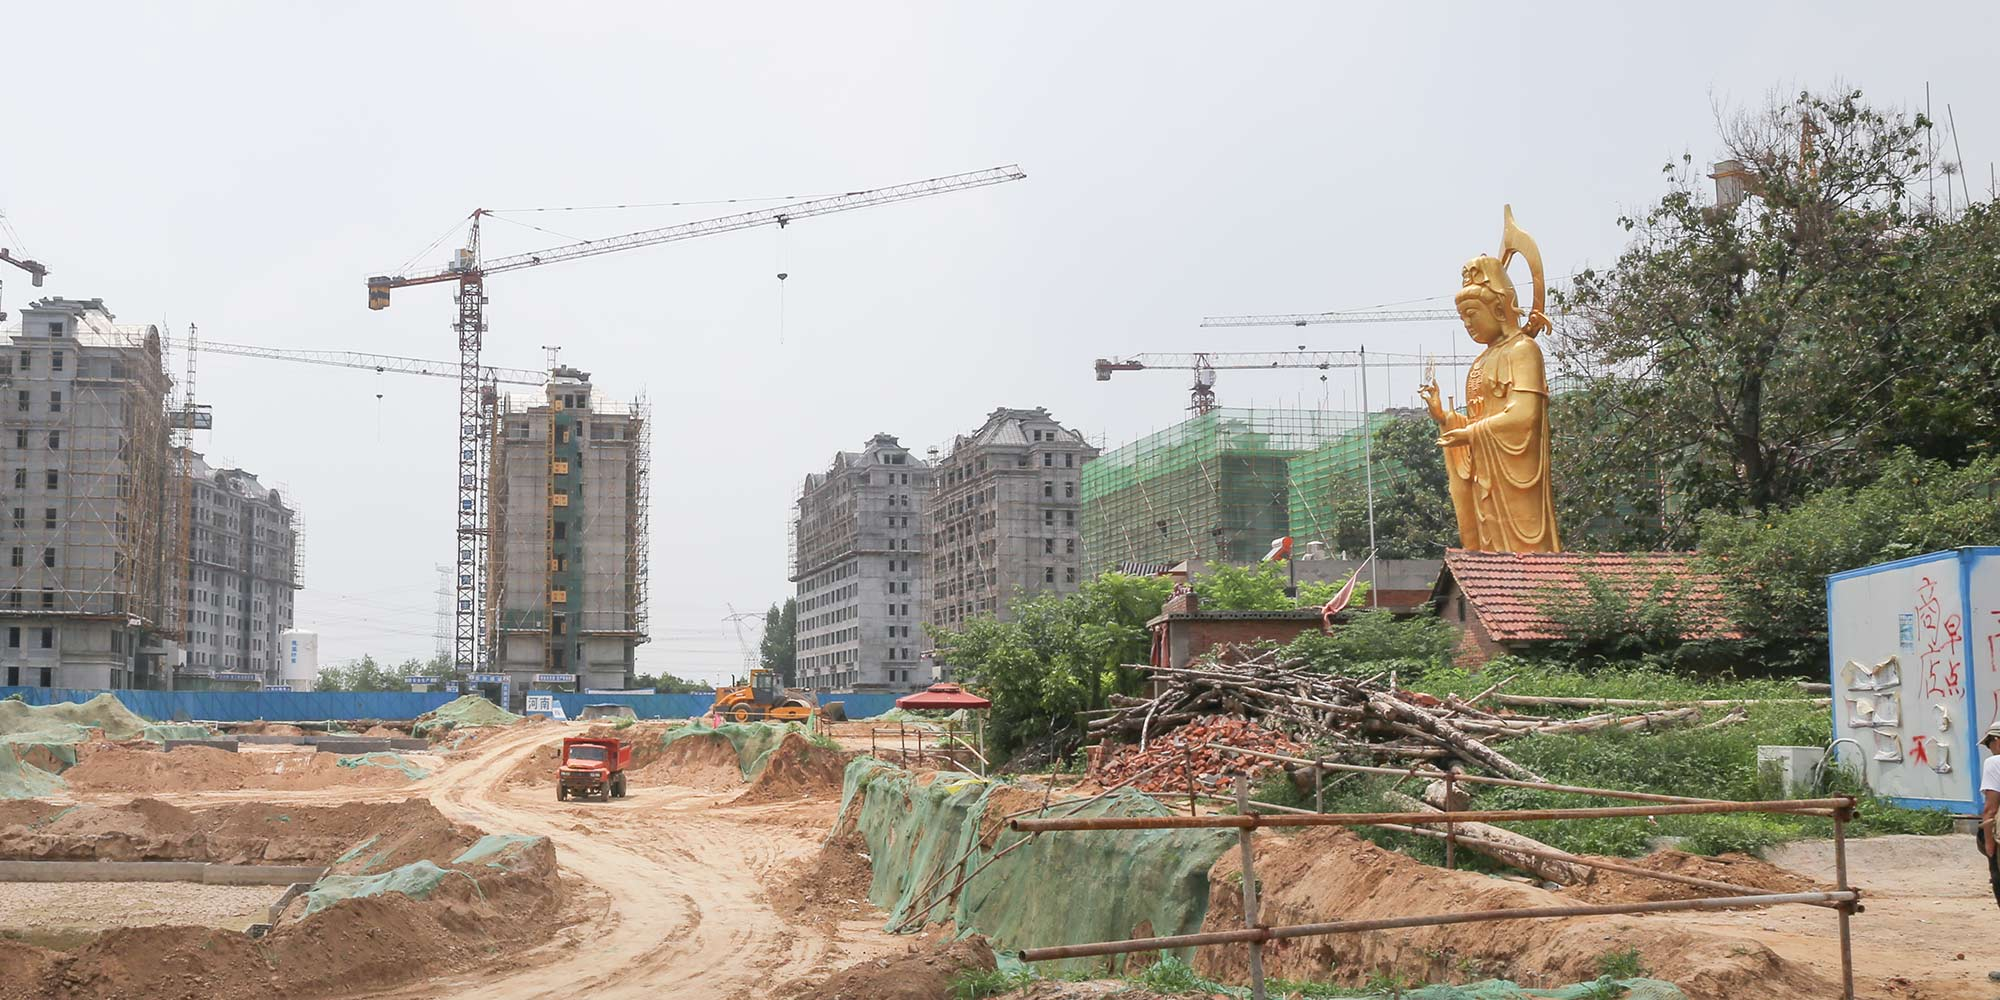 Wanita Bina Patung Buddha Setinggi 10 Meter untuk Lindungi Rumahnya